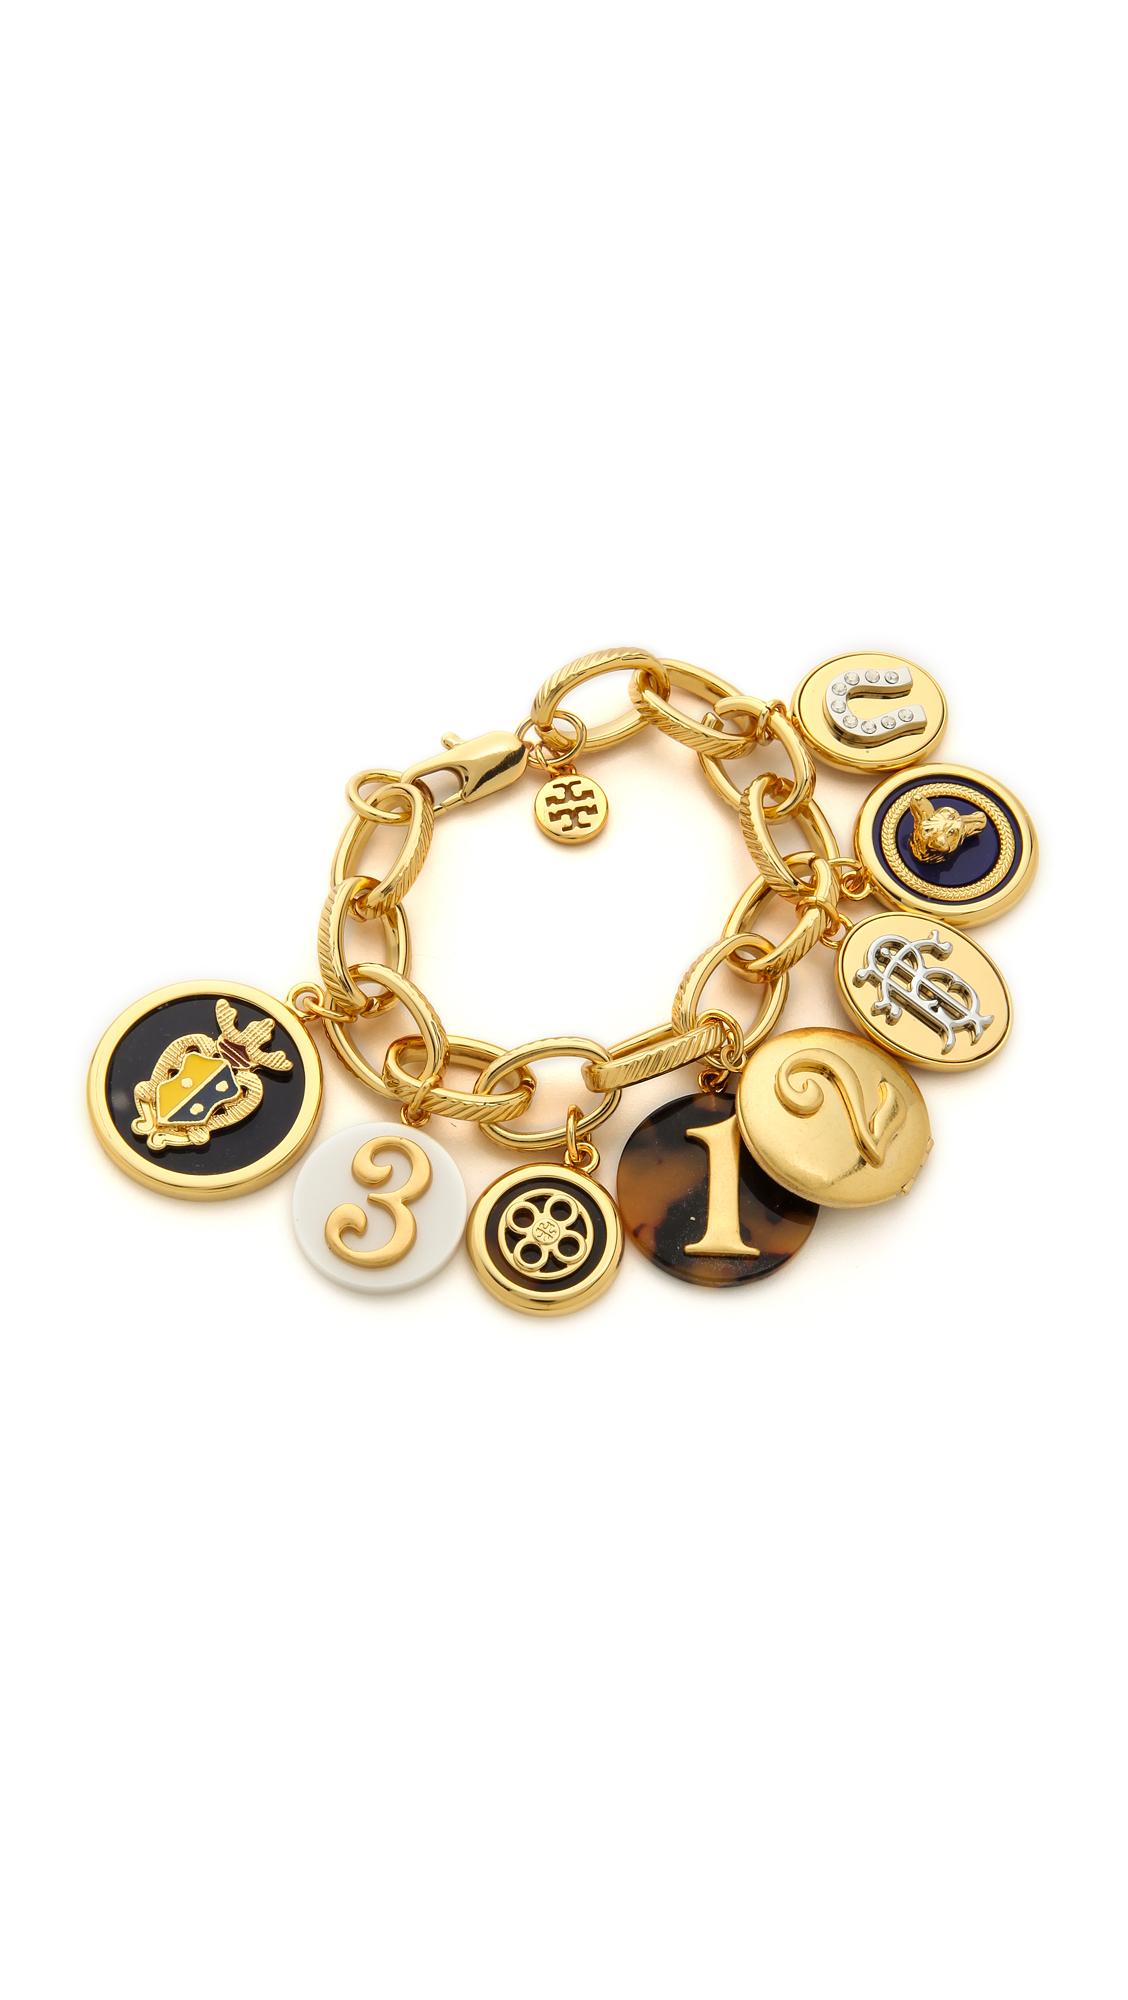 Lyst Tory Burch Dellora Charm Bracelet Multi Shiny